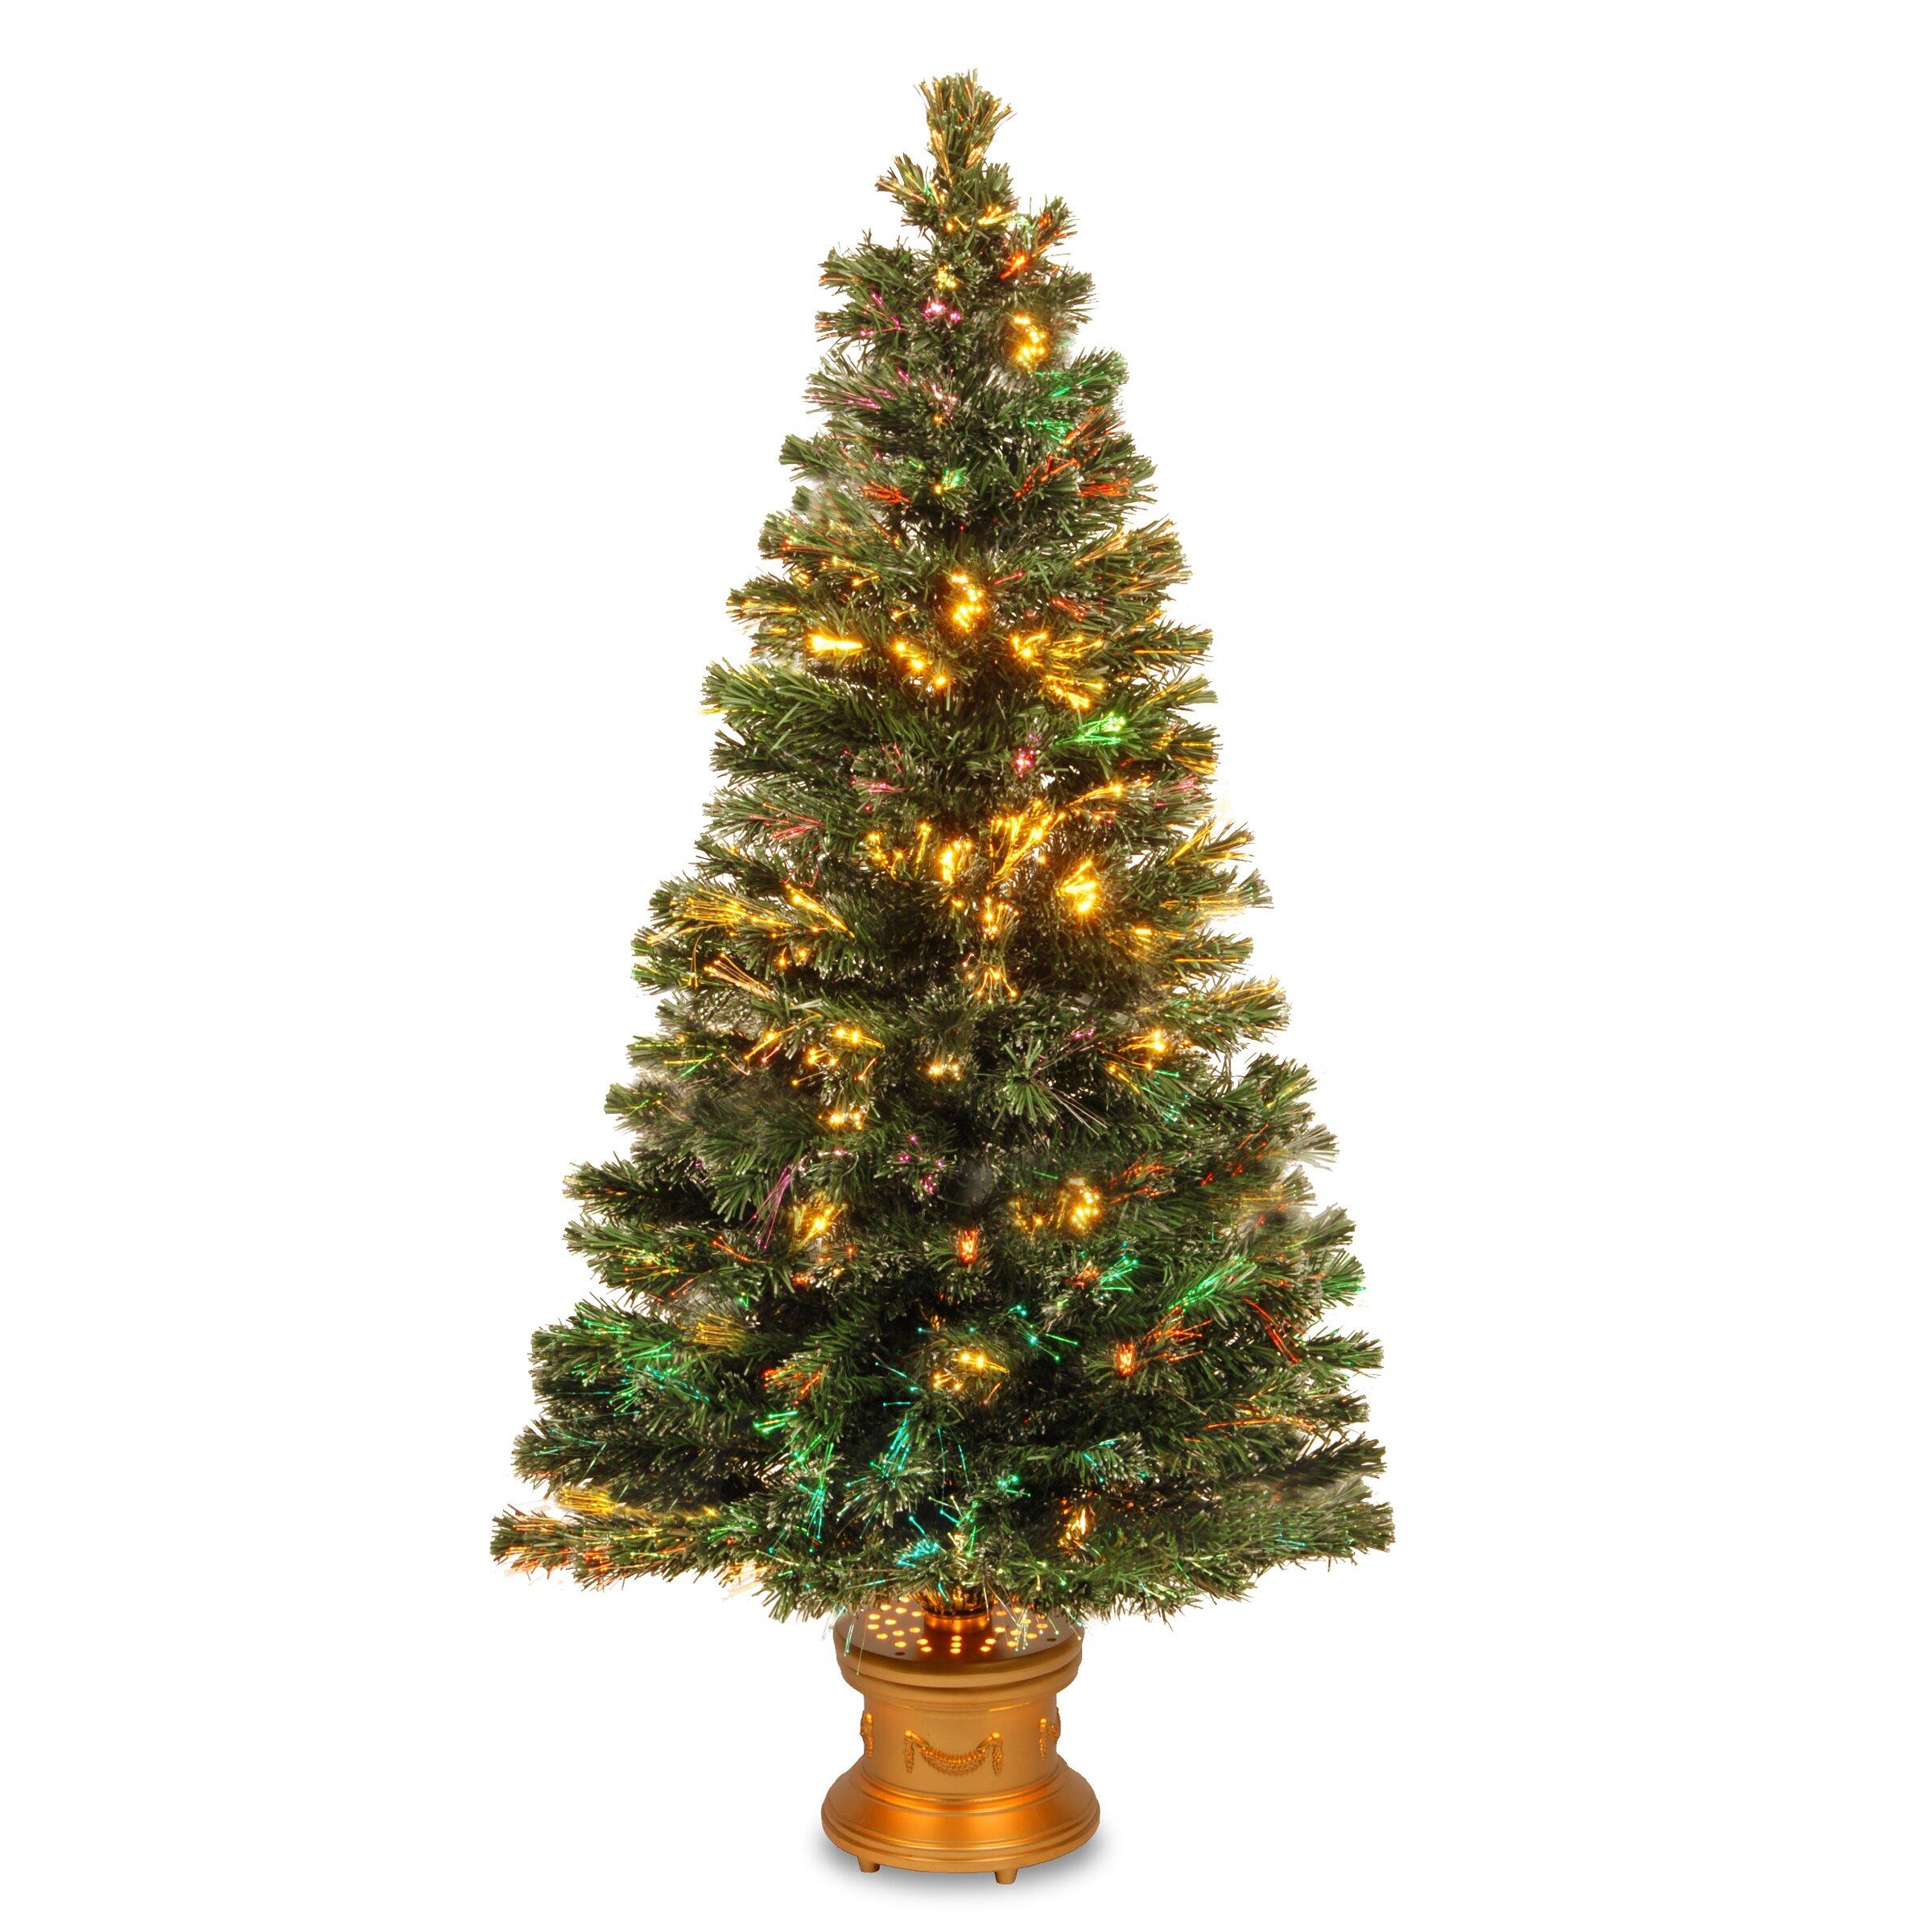 Christmas Tree Fiber Optic Lights: National Tree Co. Fiber Optics Evergreen Firework 5